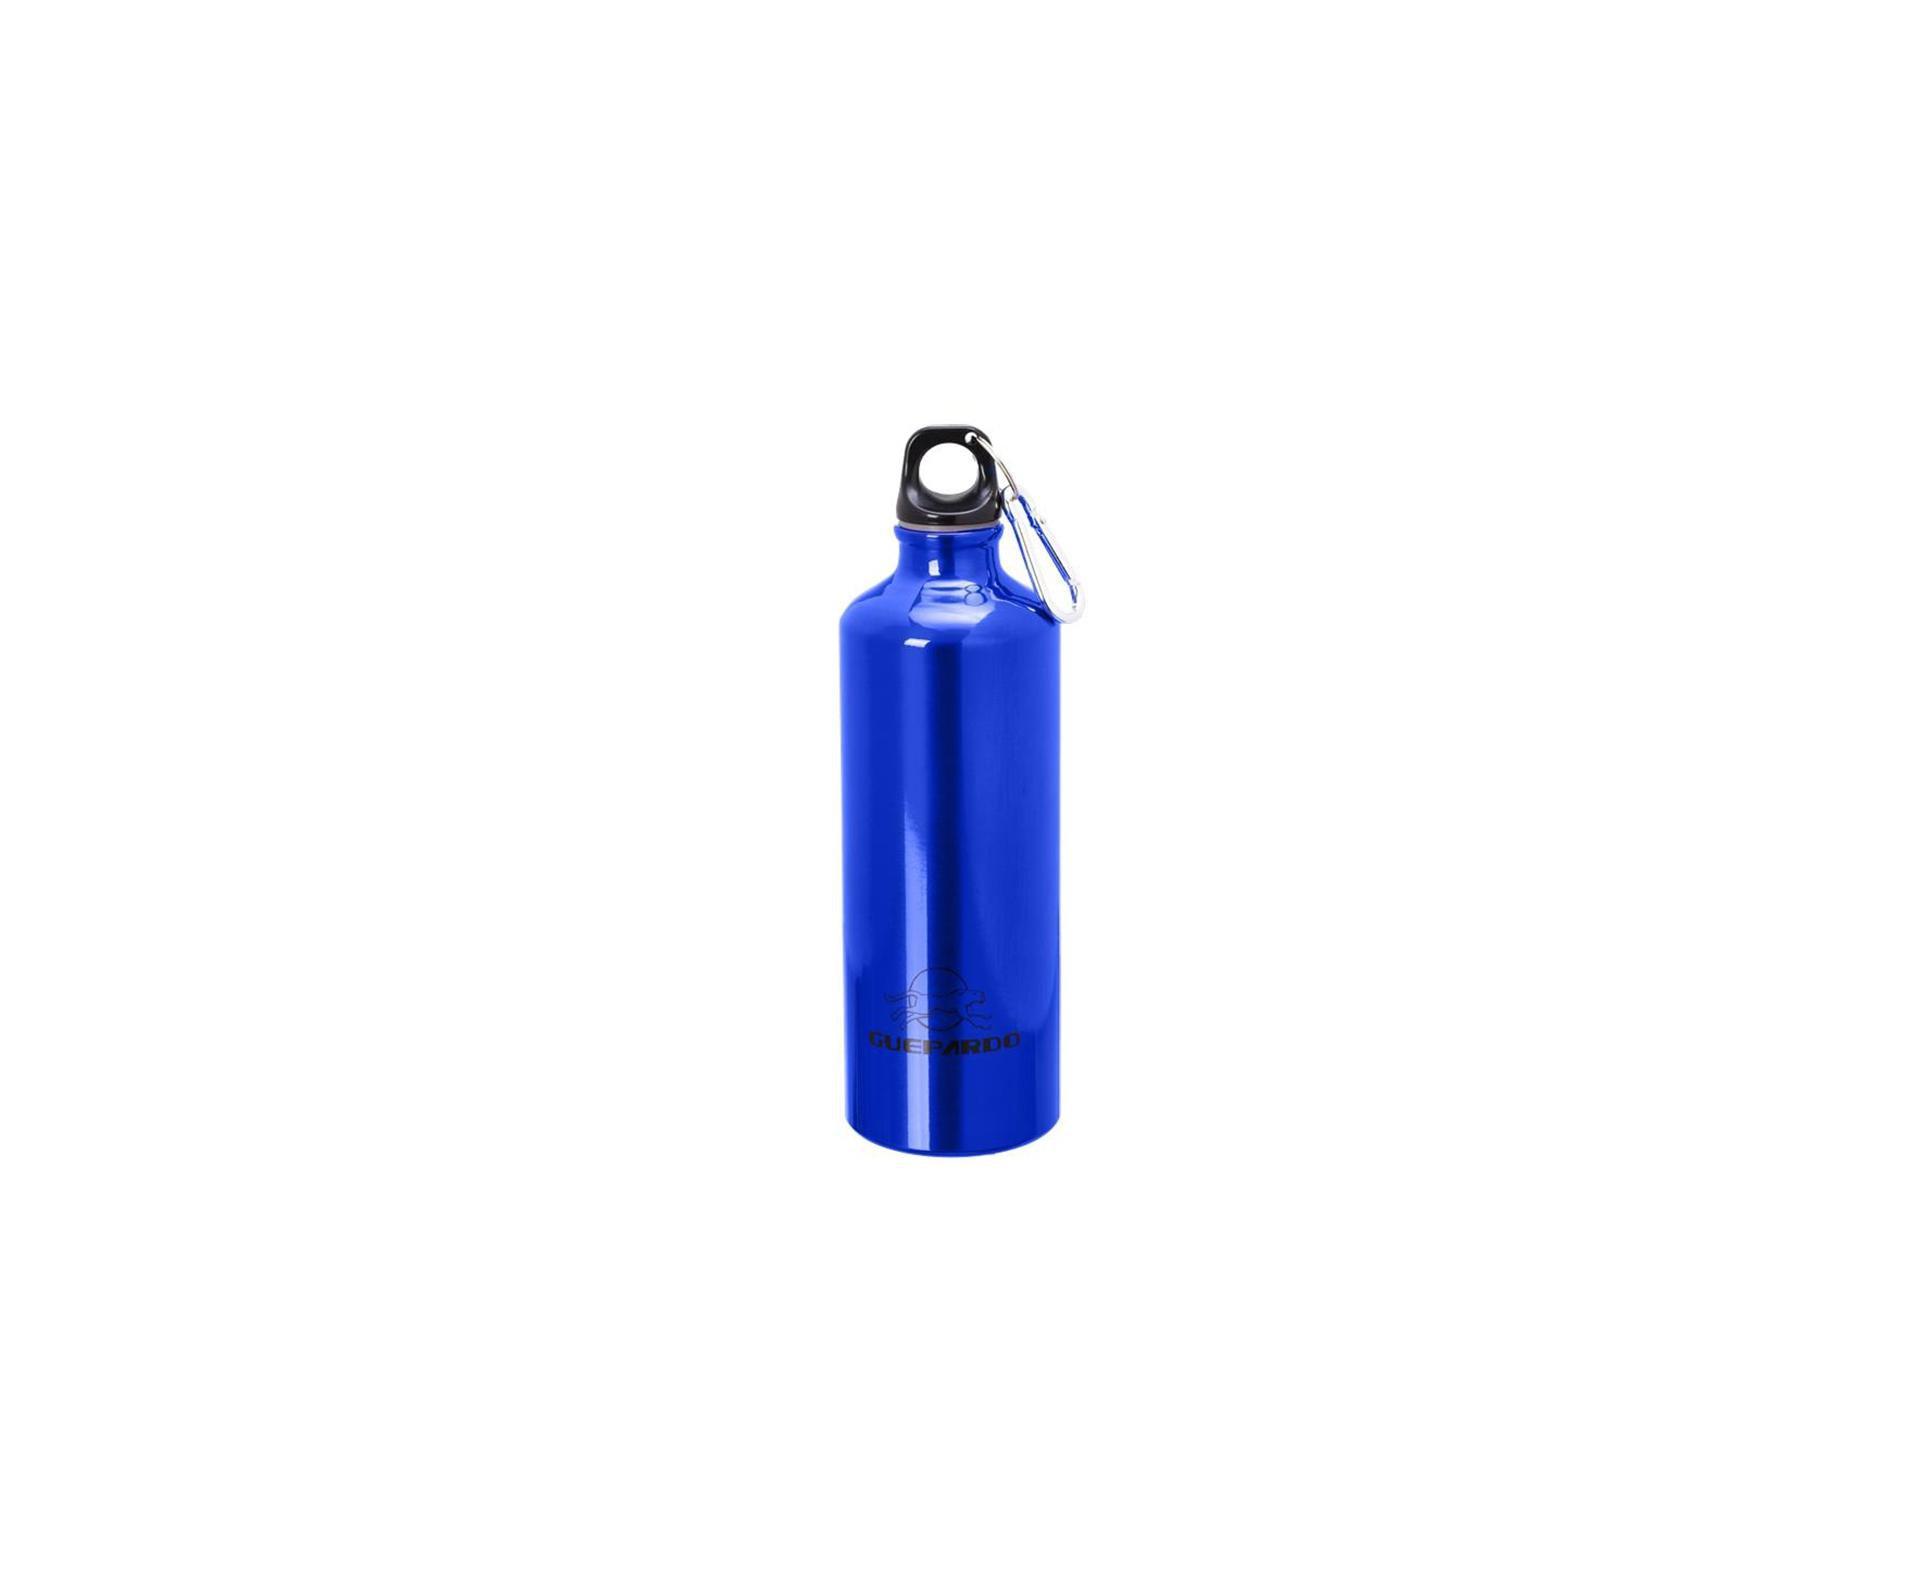 Garrafa Esportiva Azul De Alumínio 1 Lt - Guepardo